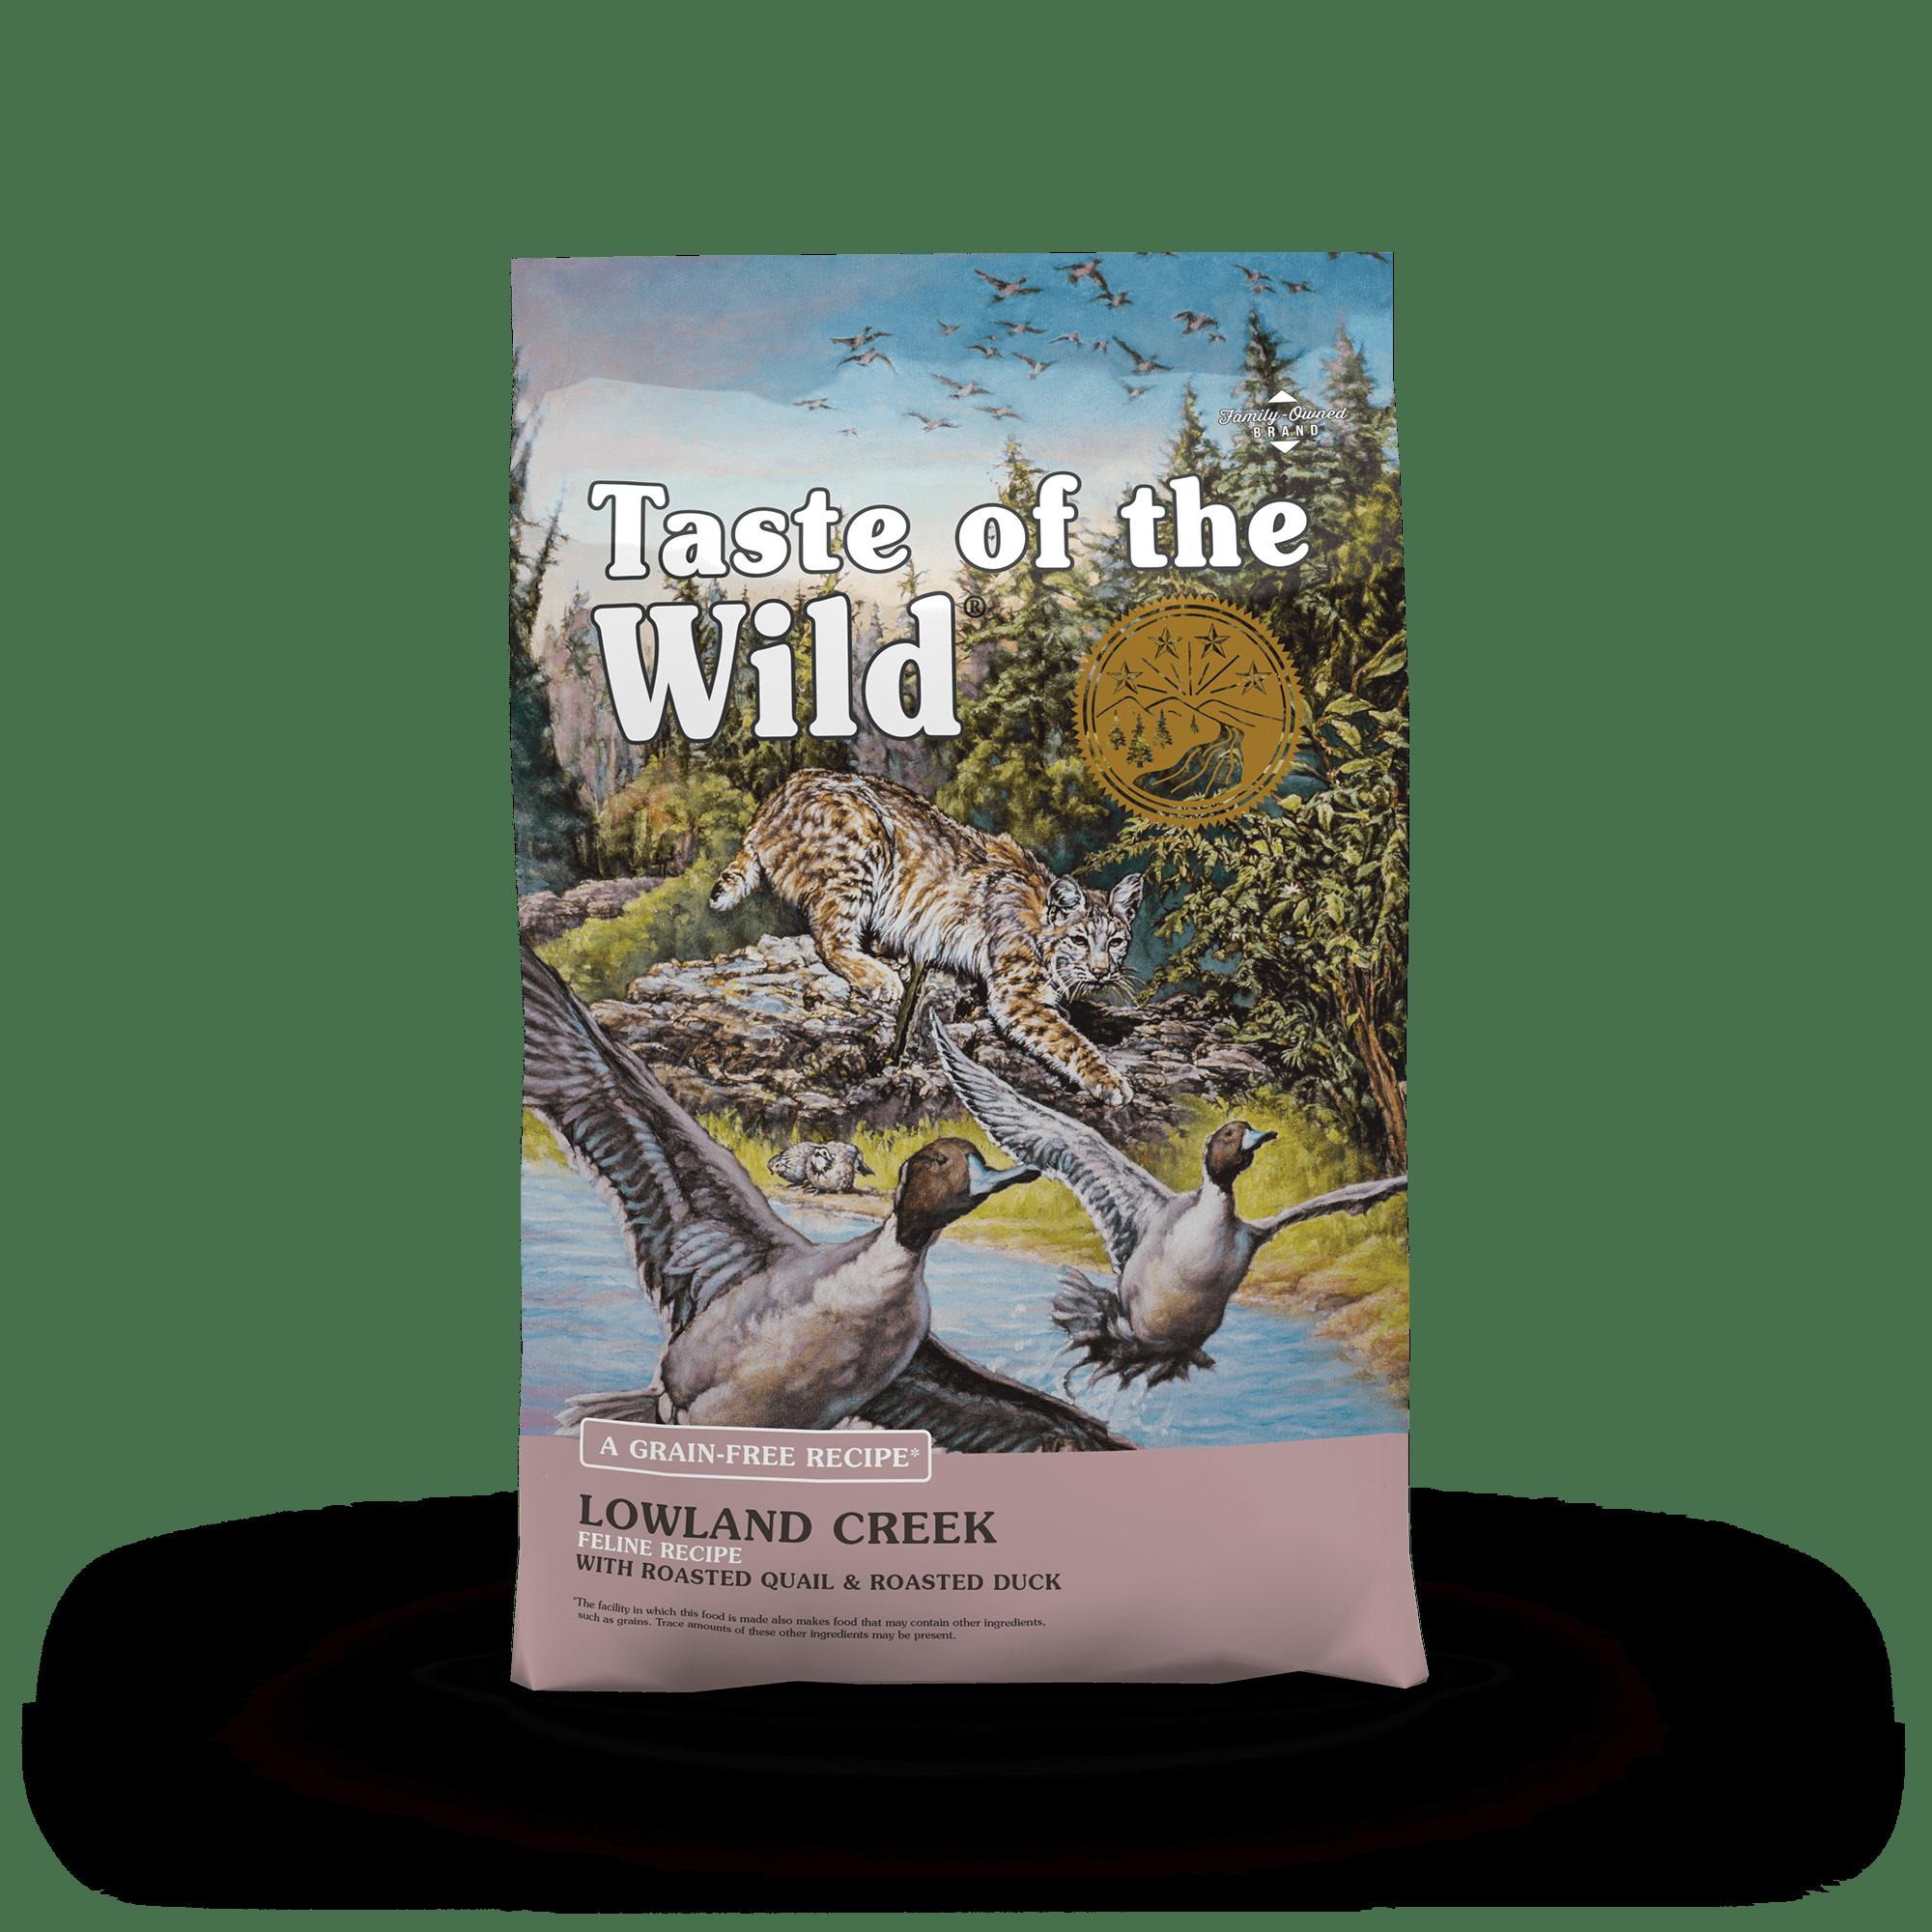 Lowland Creek Feline Recipe with Roasted Quail & Roasted Duck Image